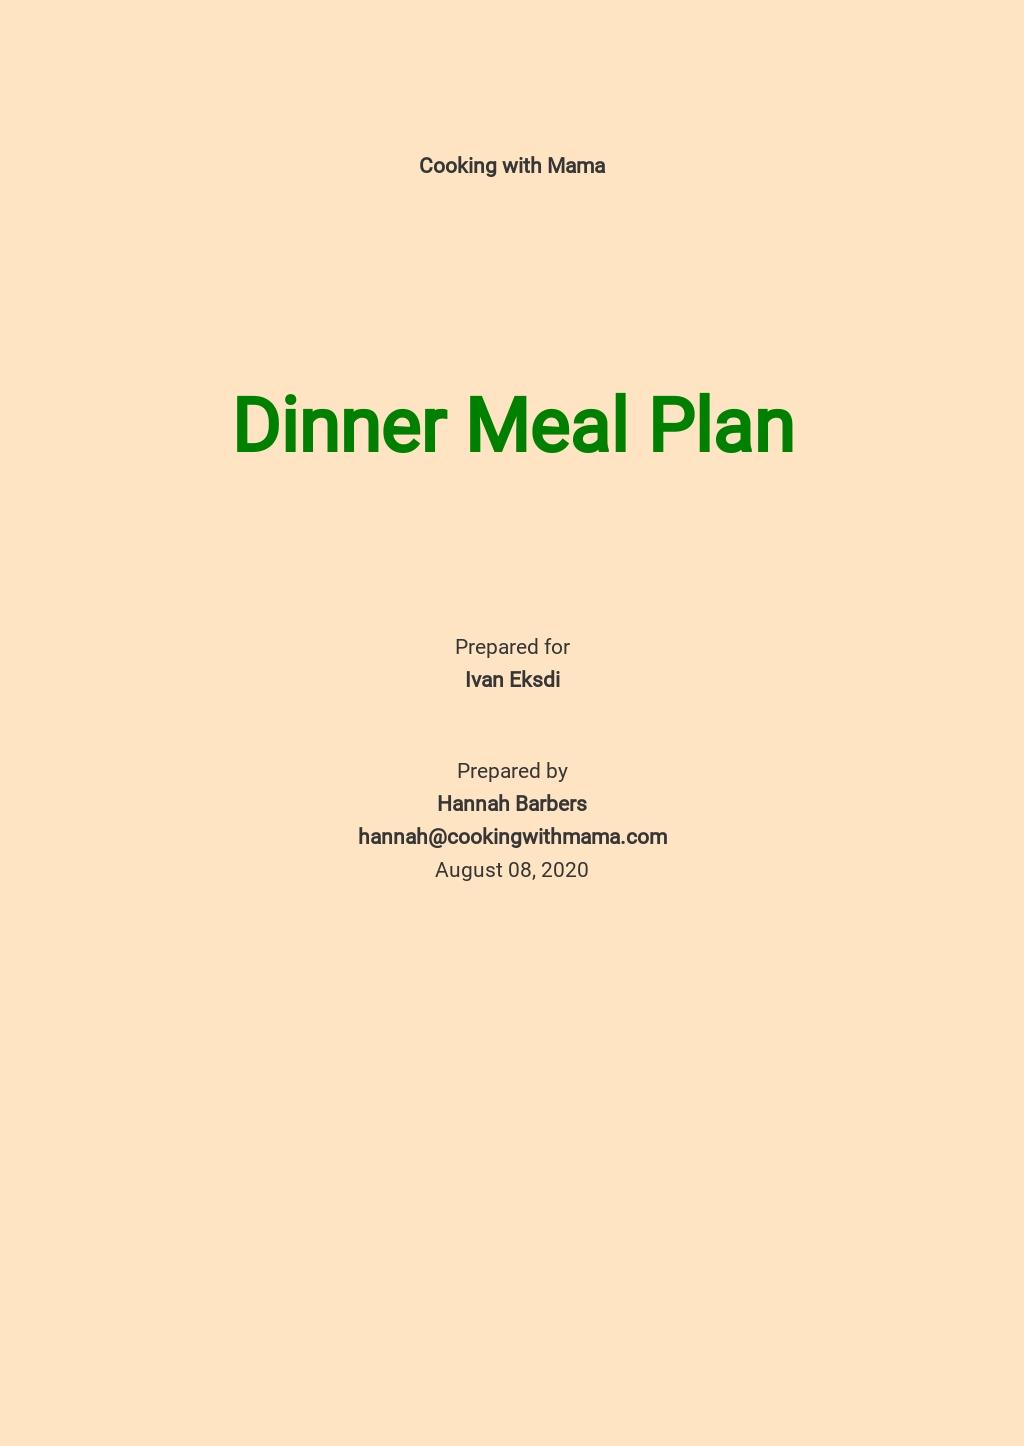 Dinner Meal Plan Template.jpe